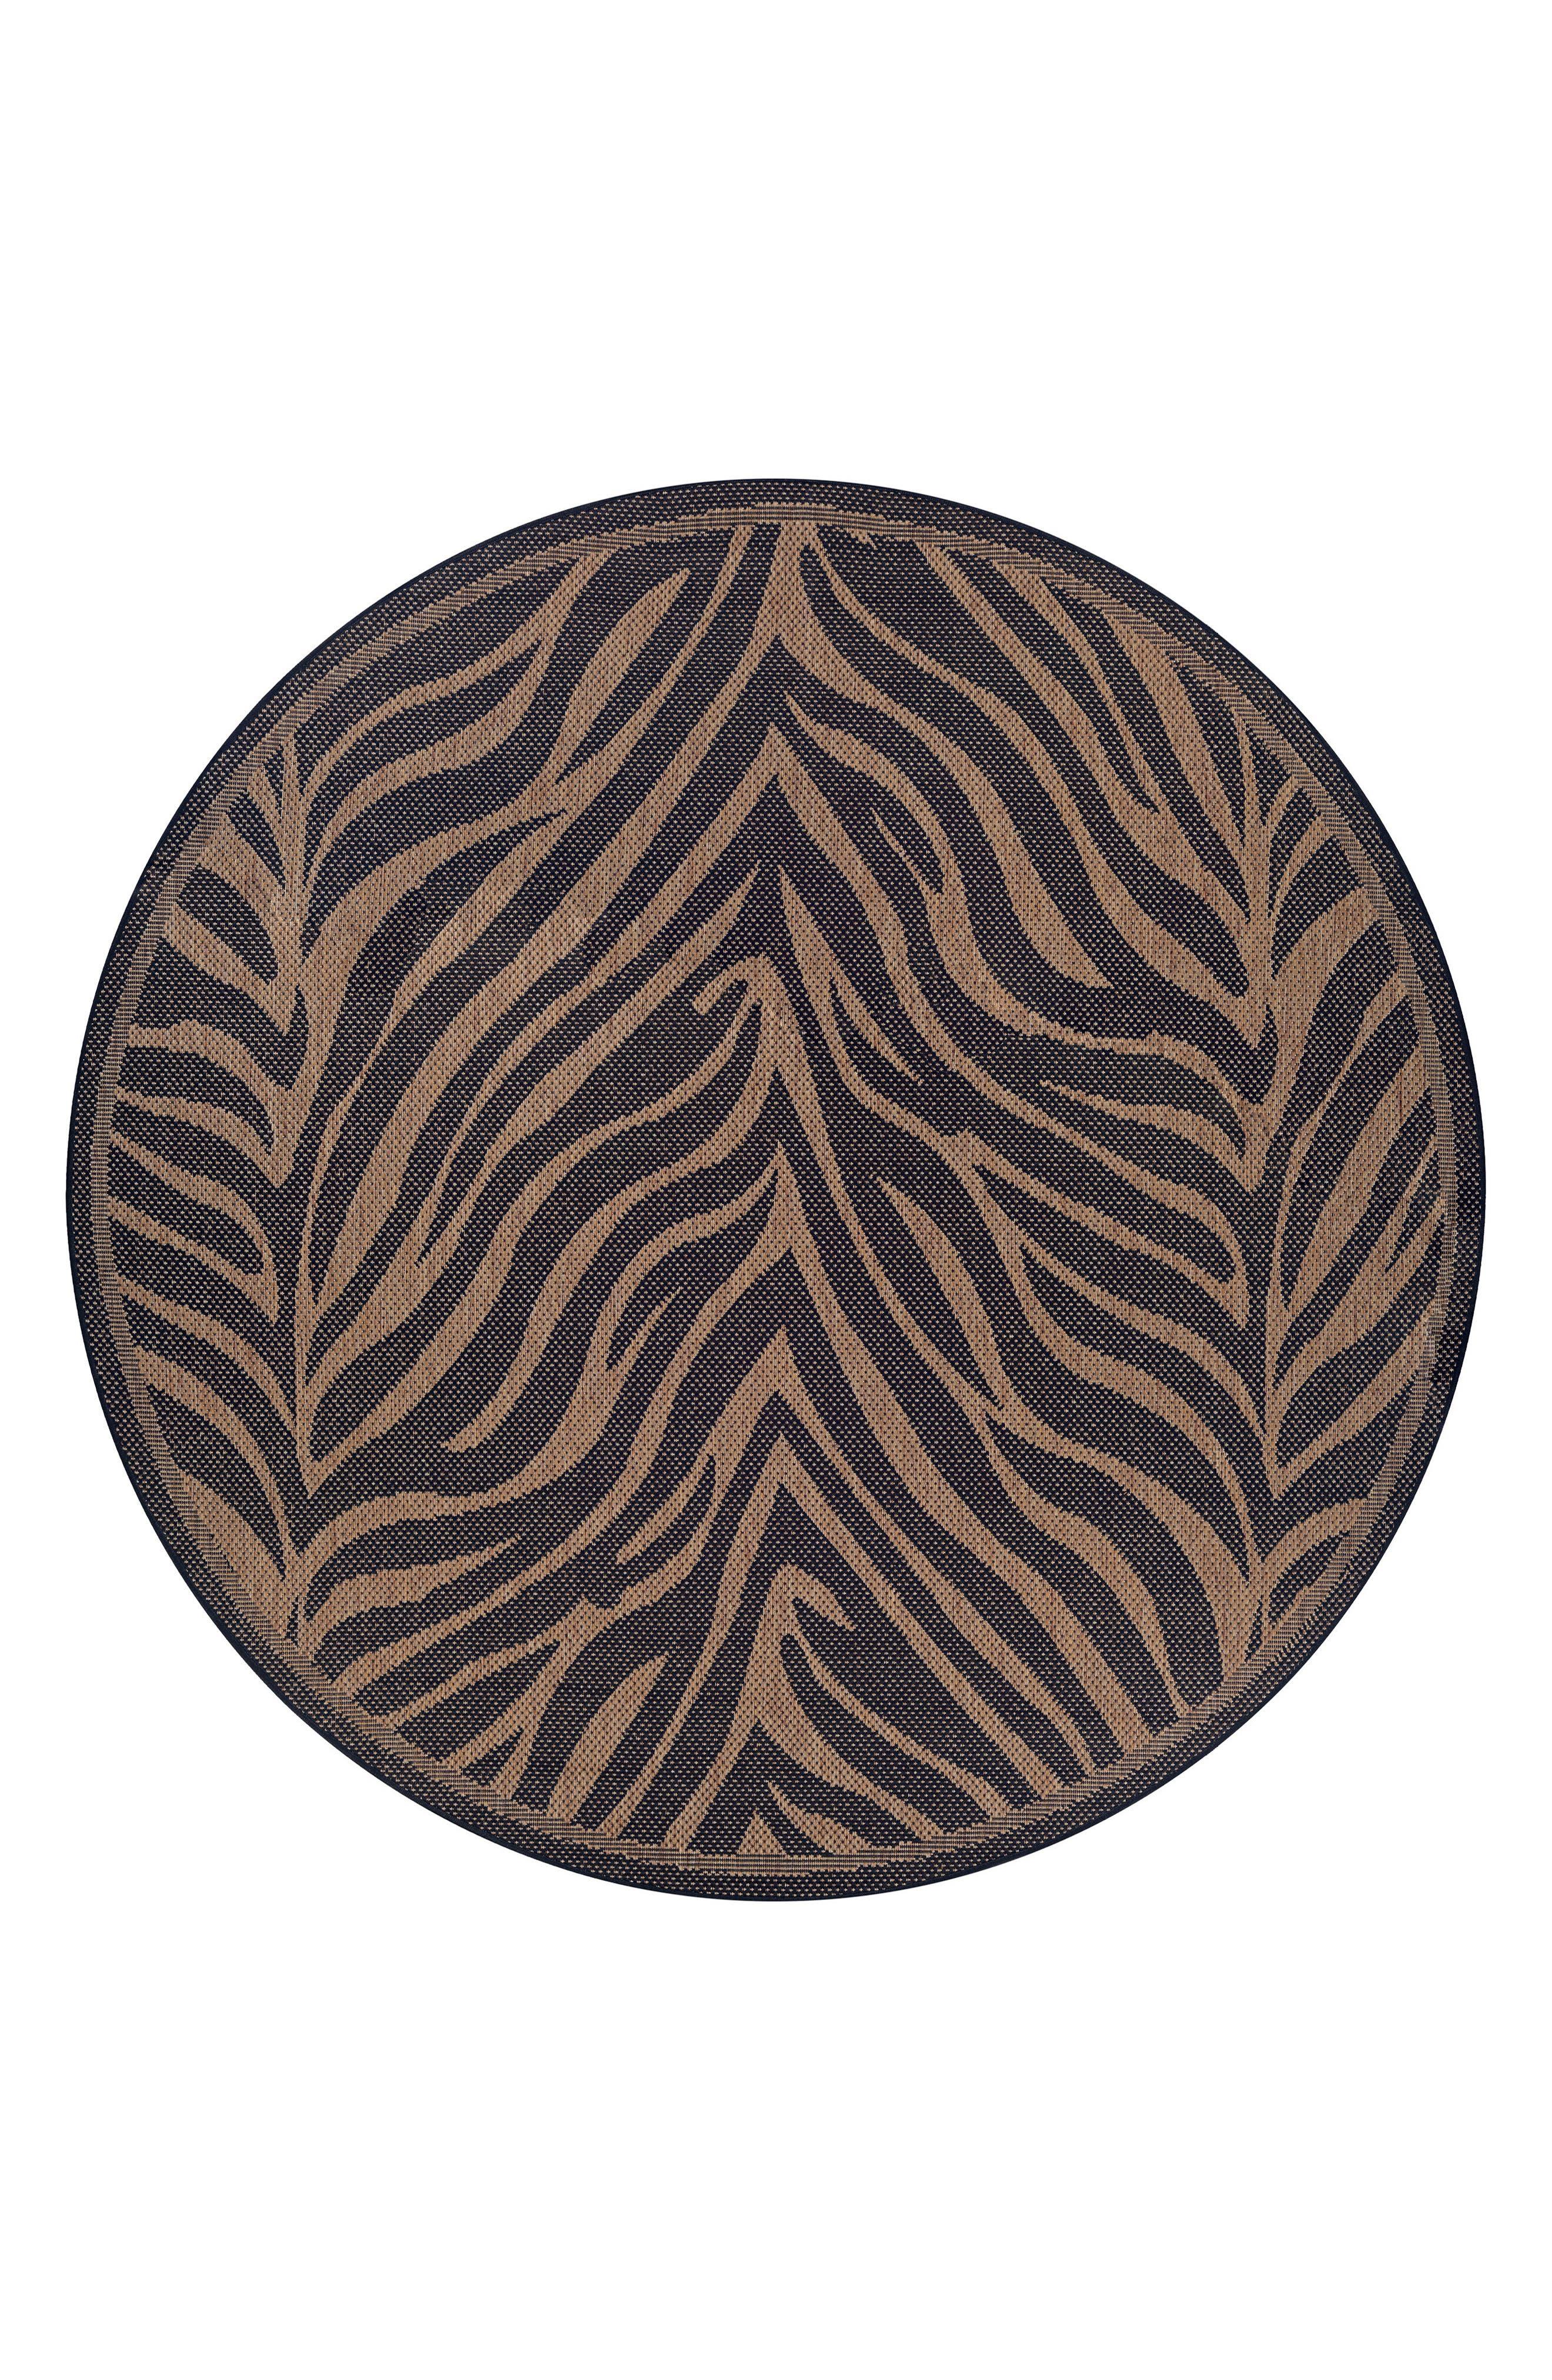 Recife Zebra Indoor/Outdoor Rug,                             Alternate thumbnail 2, color,                             BLACK/ COCOA